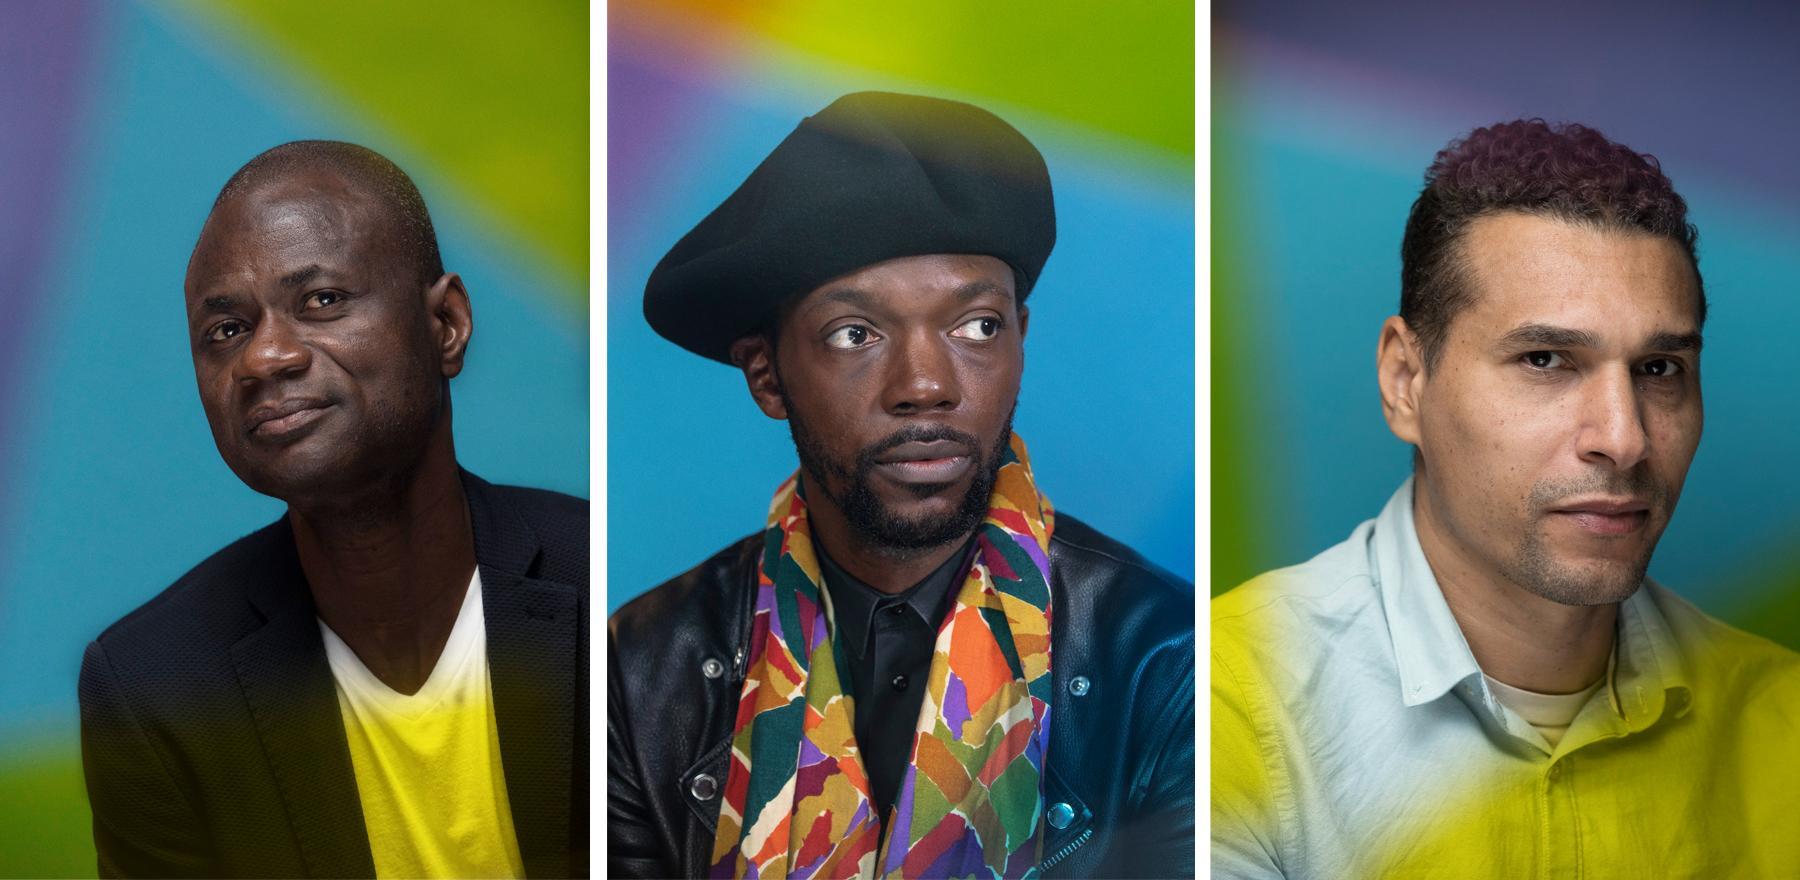 Portraits (left to right) Festival director Alex Moussa Sawadogo, rapper & filmmaker Baloji and film director Yuri Ceuninck.